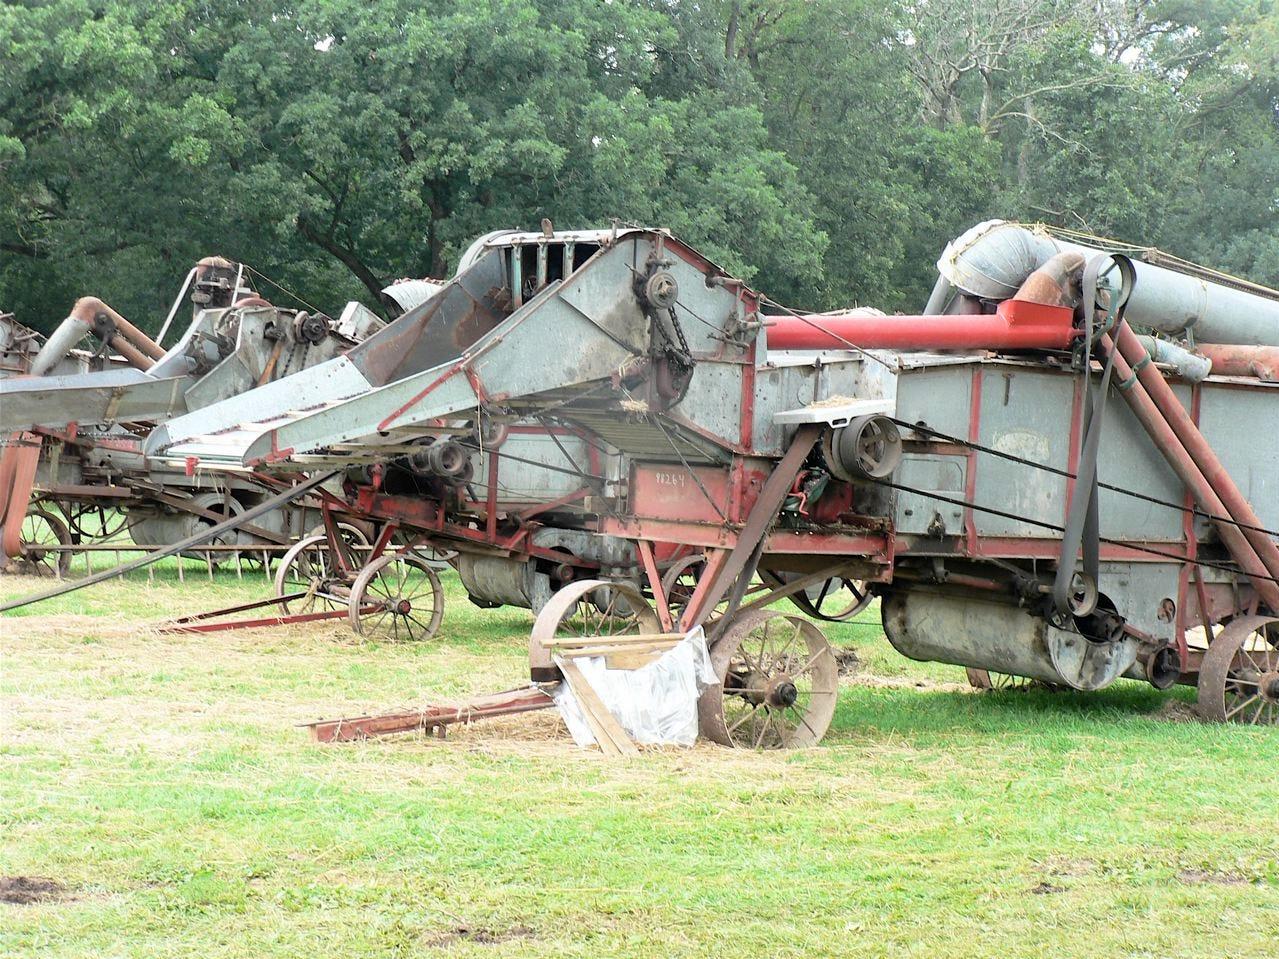 A line of threshing machinery stands quiet under rain threatening skies.